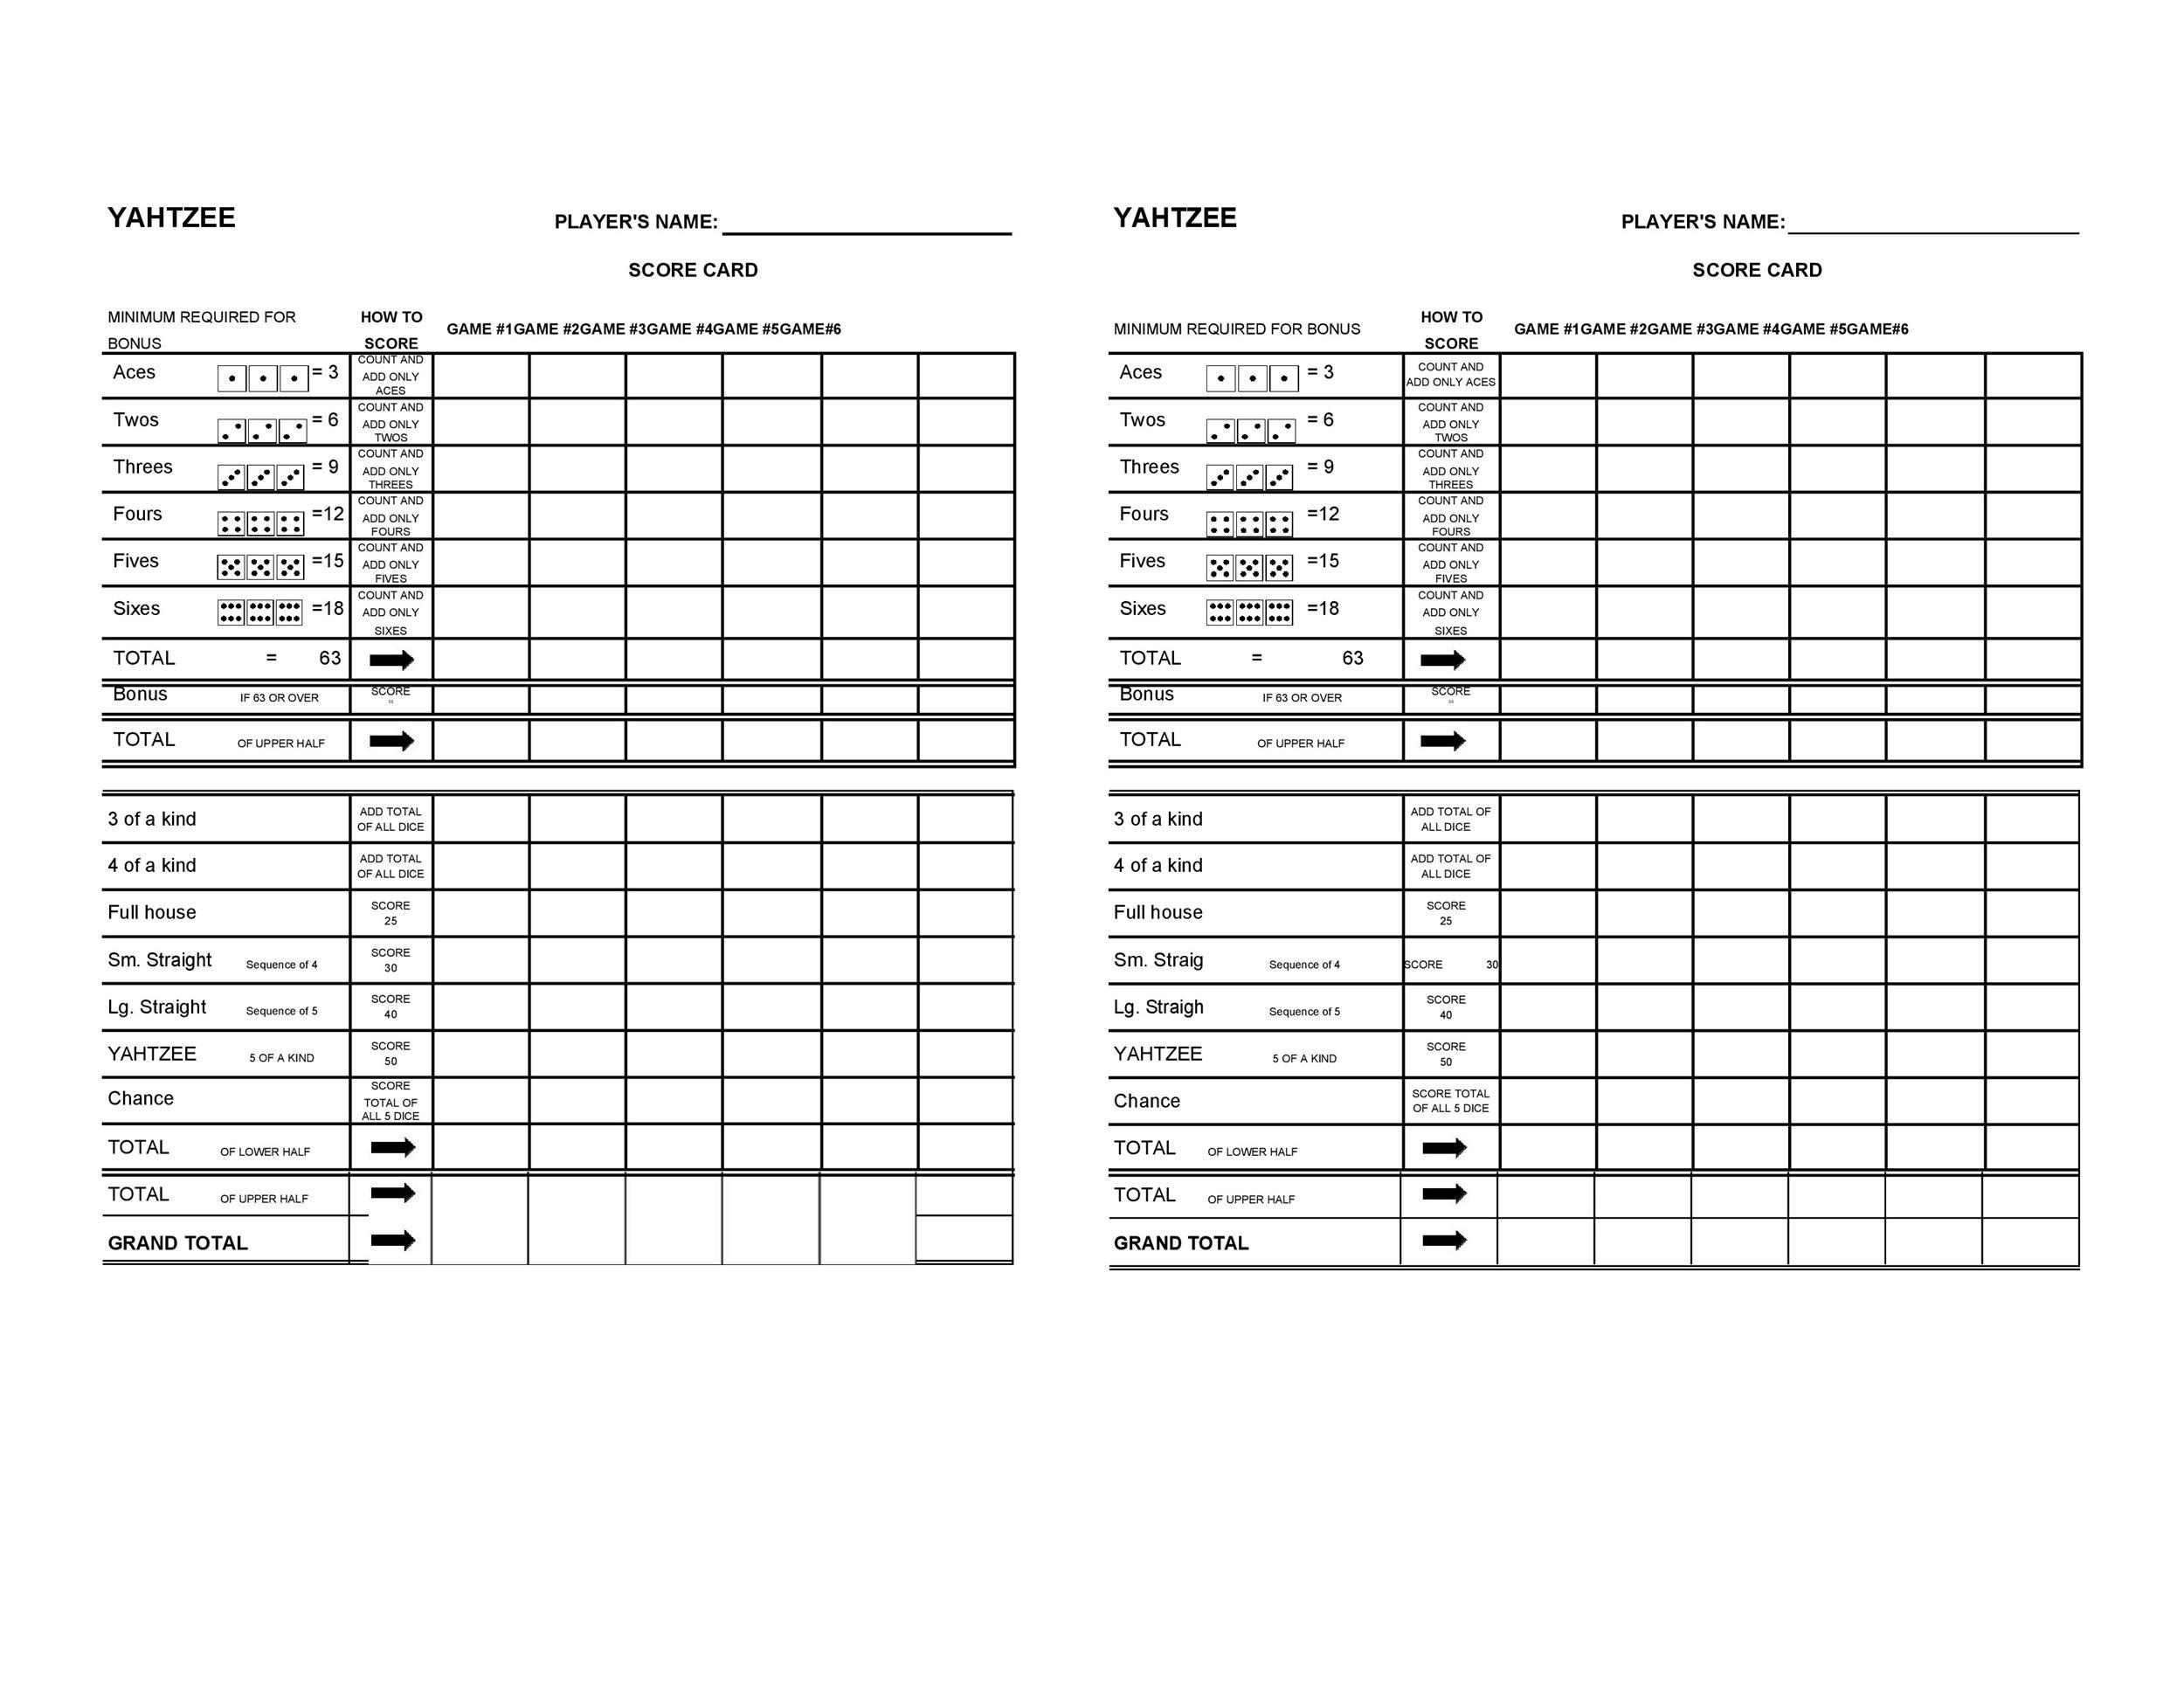 photograph regarding Printable Yahtzee Score Pads referred to as Printable Yahtzee Rating Card Pdf